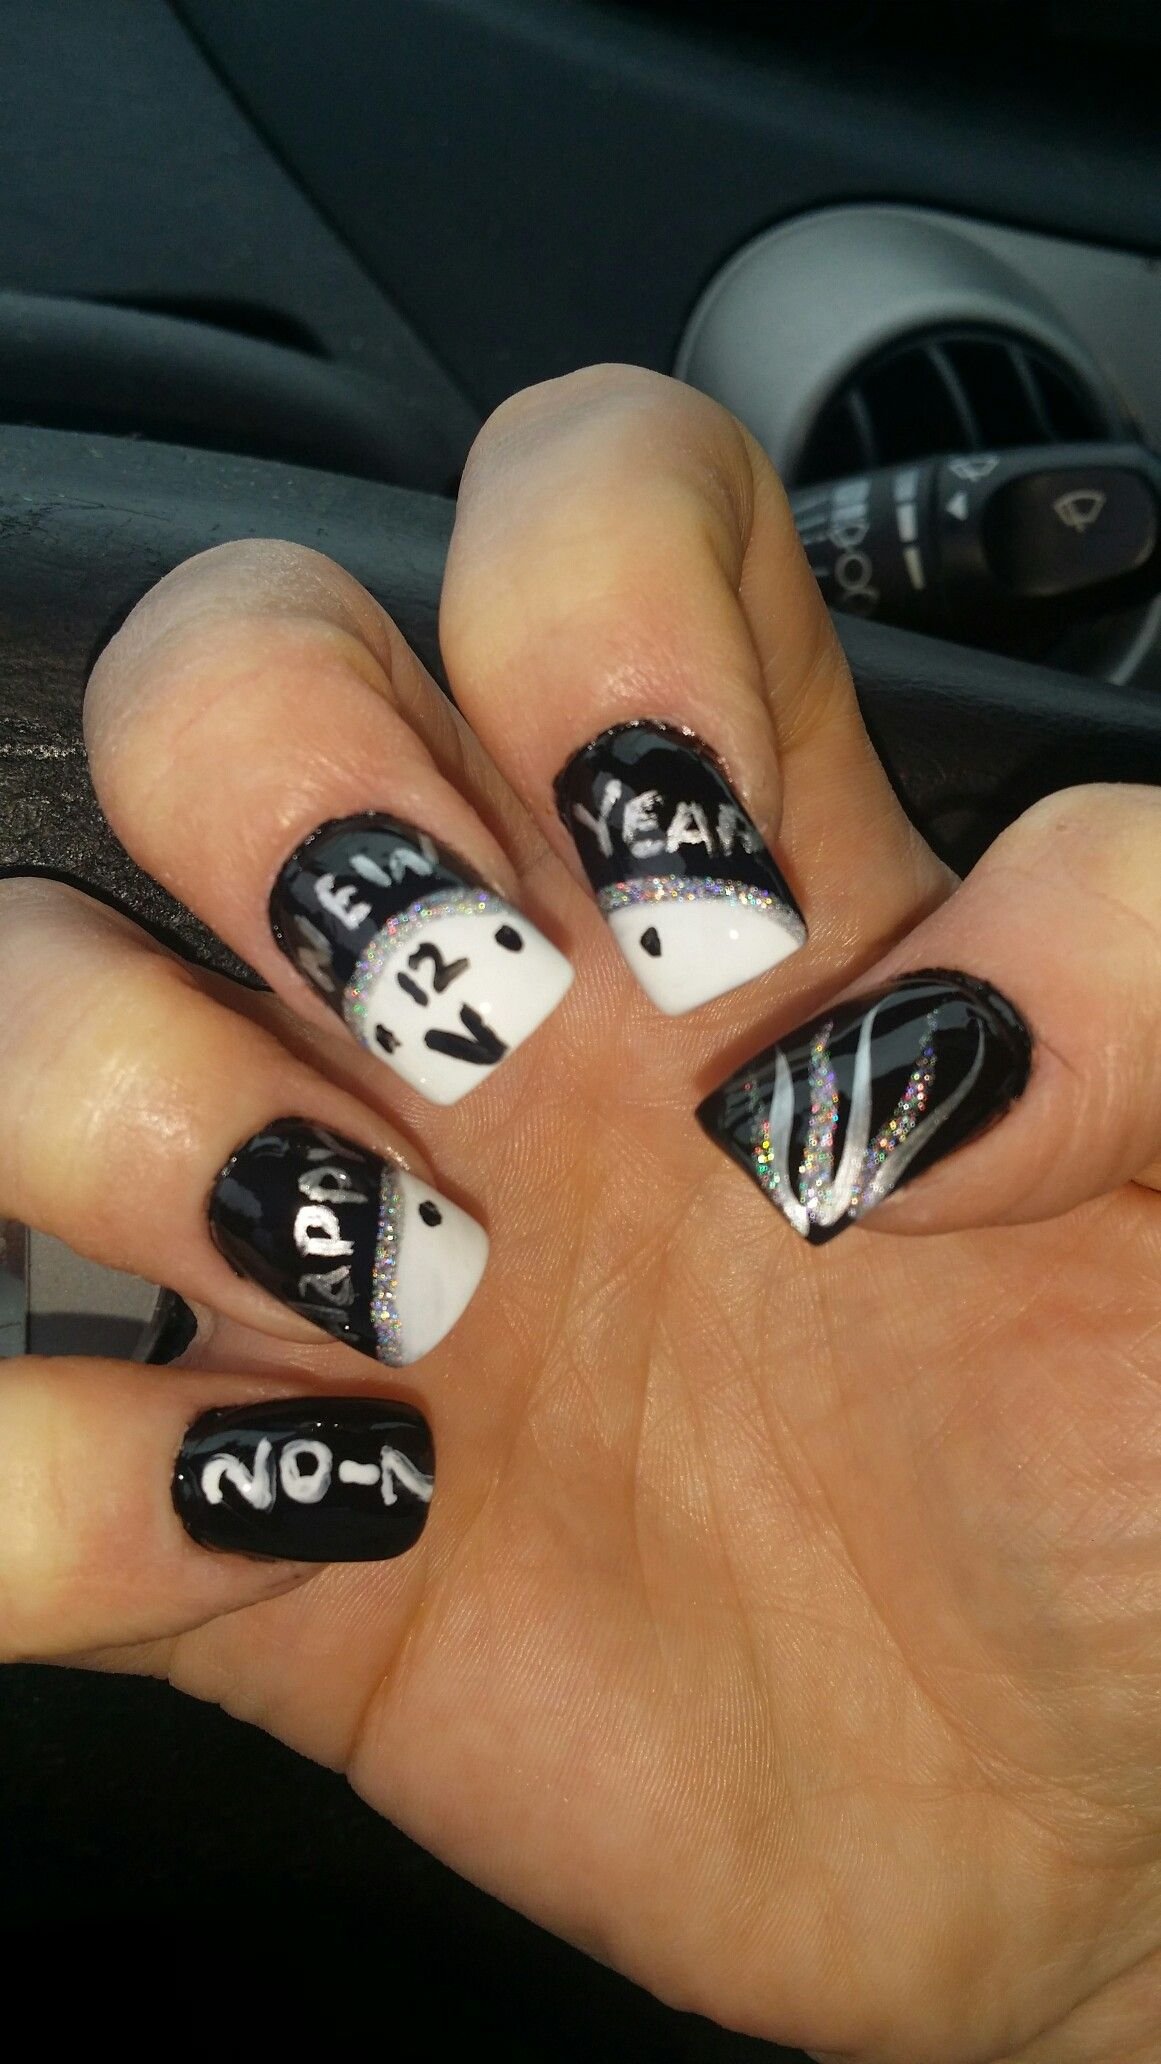 New years nails | Nails | Pinterest